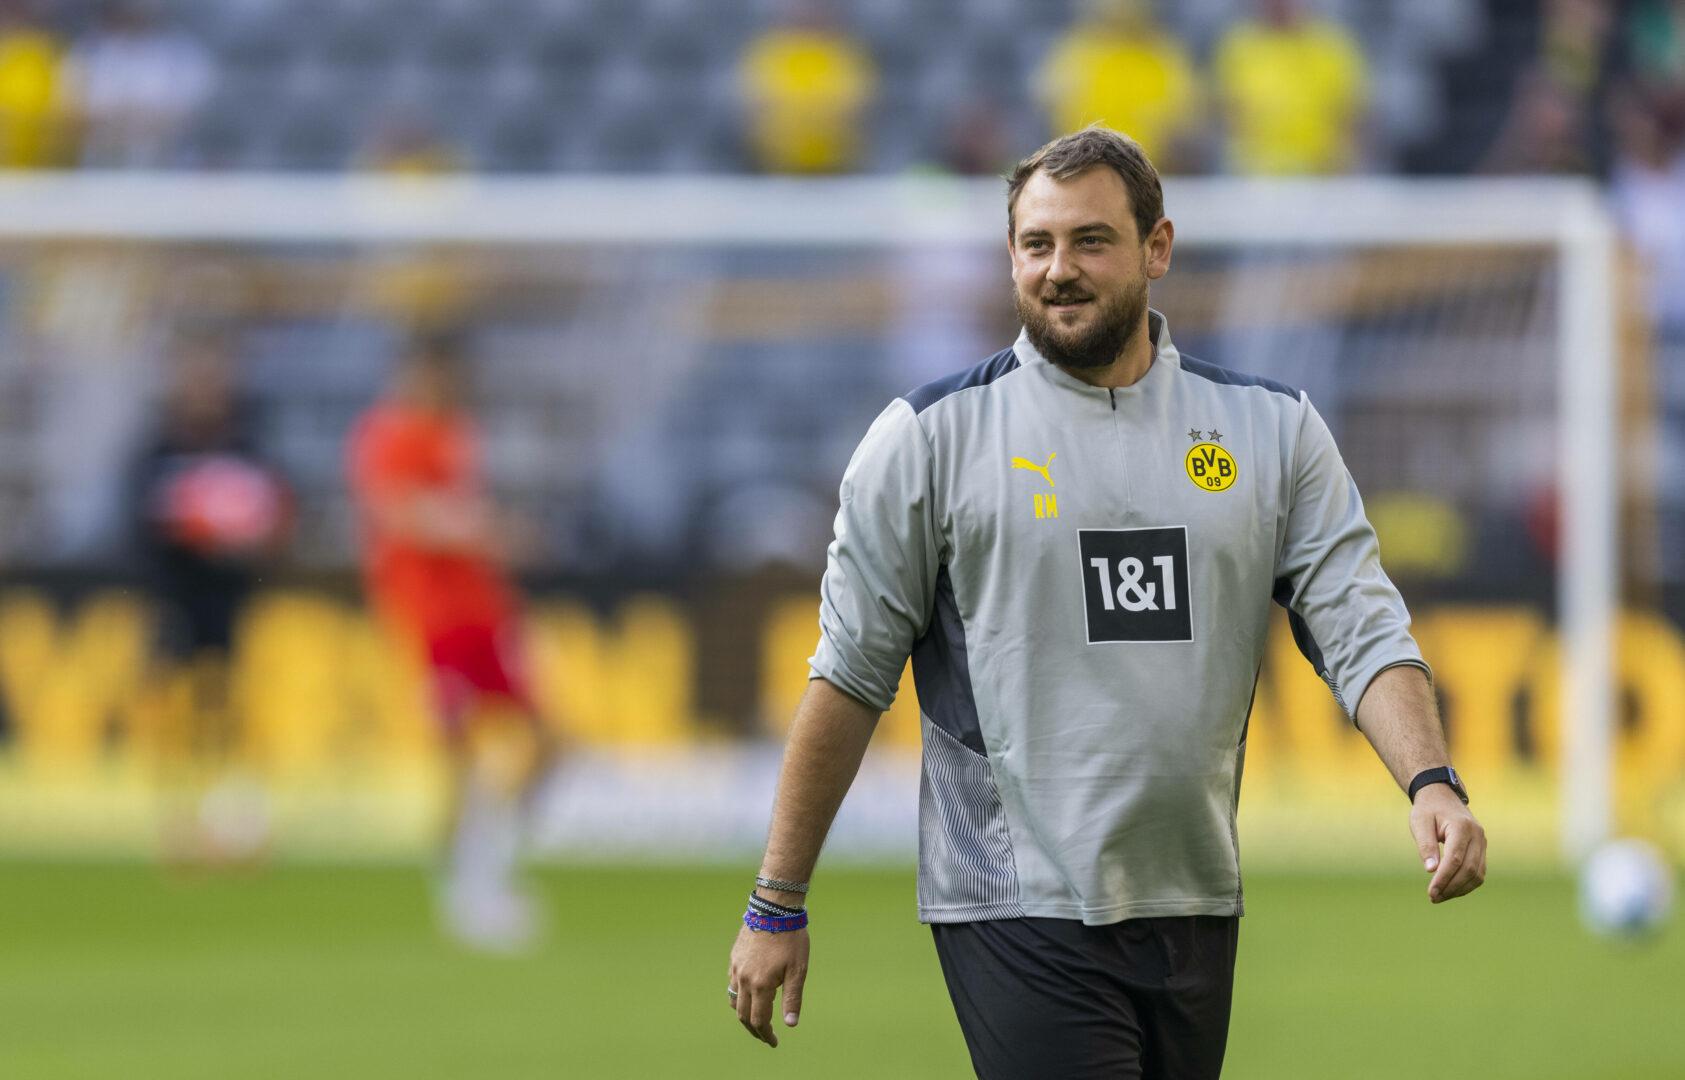 Axel Witsel in die Premier League? BVB-Co-Trainer Maric mit Dementi!